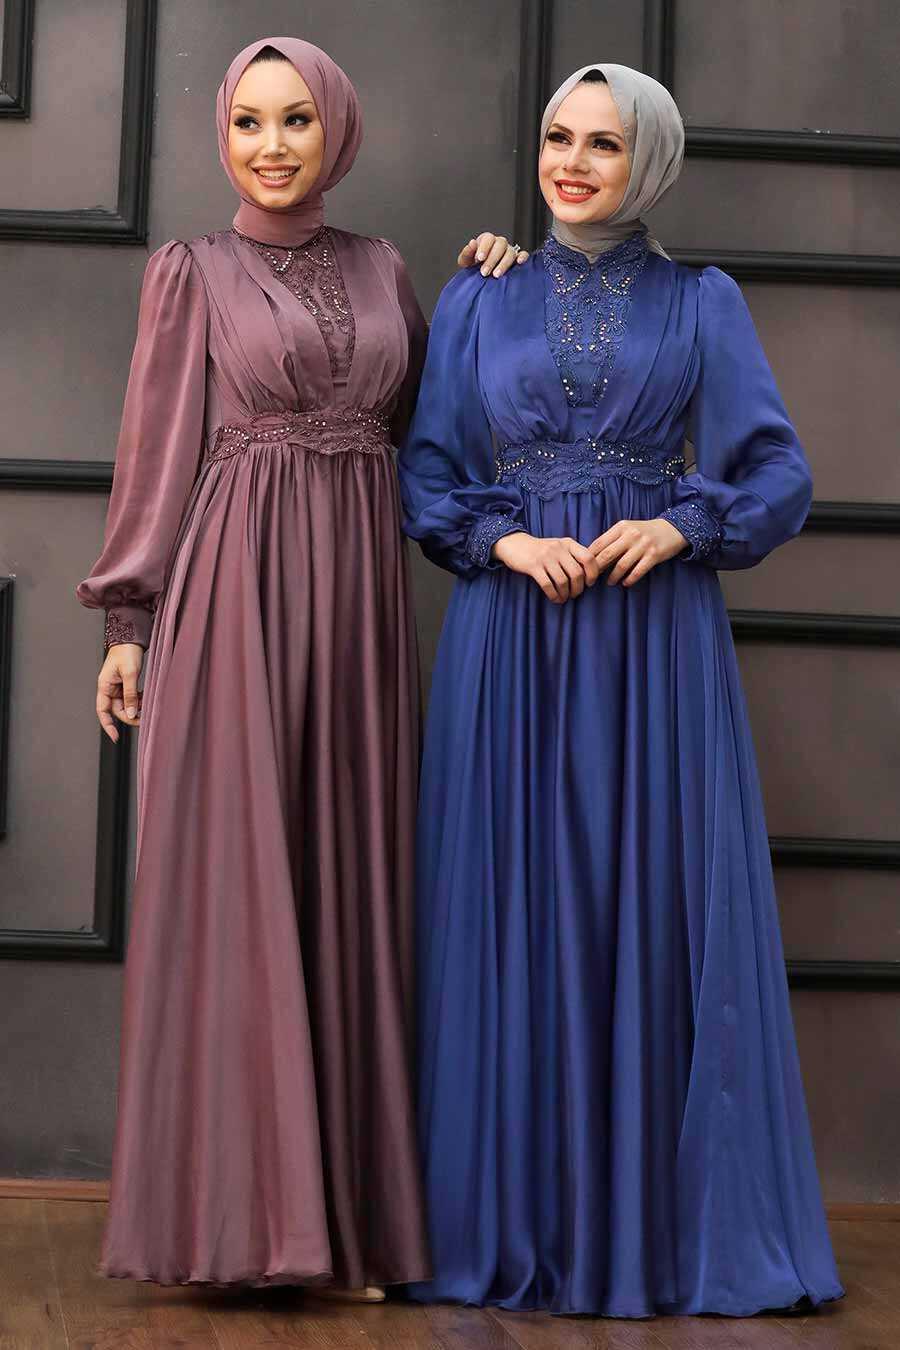 İndigo Blue Hijab Evening Dress 21540IM